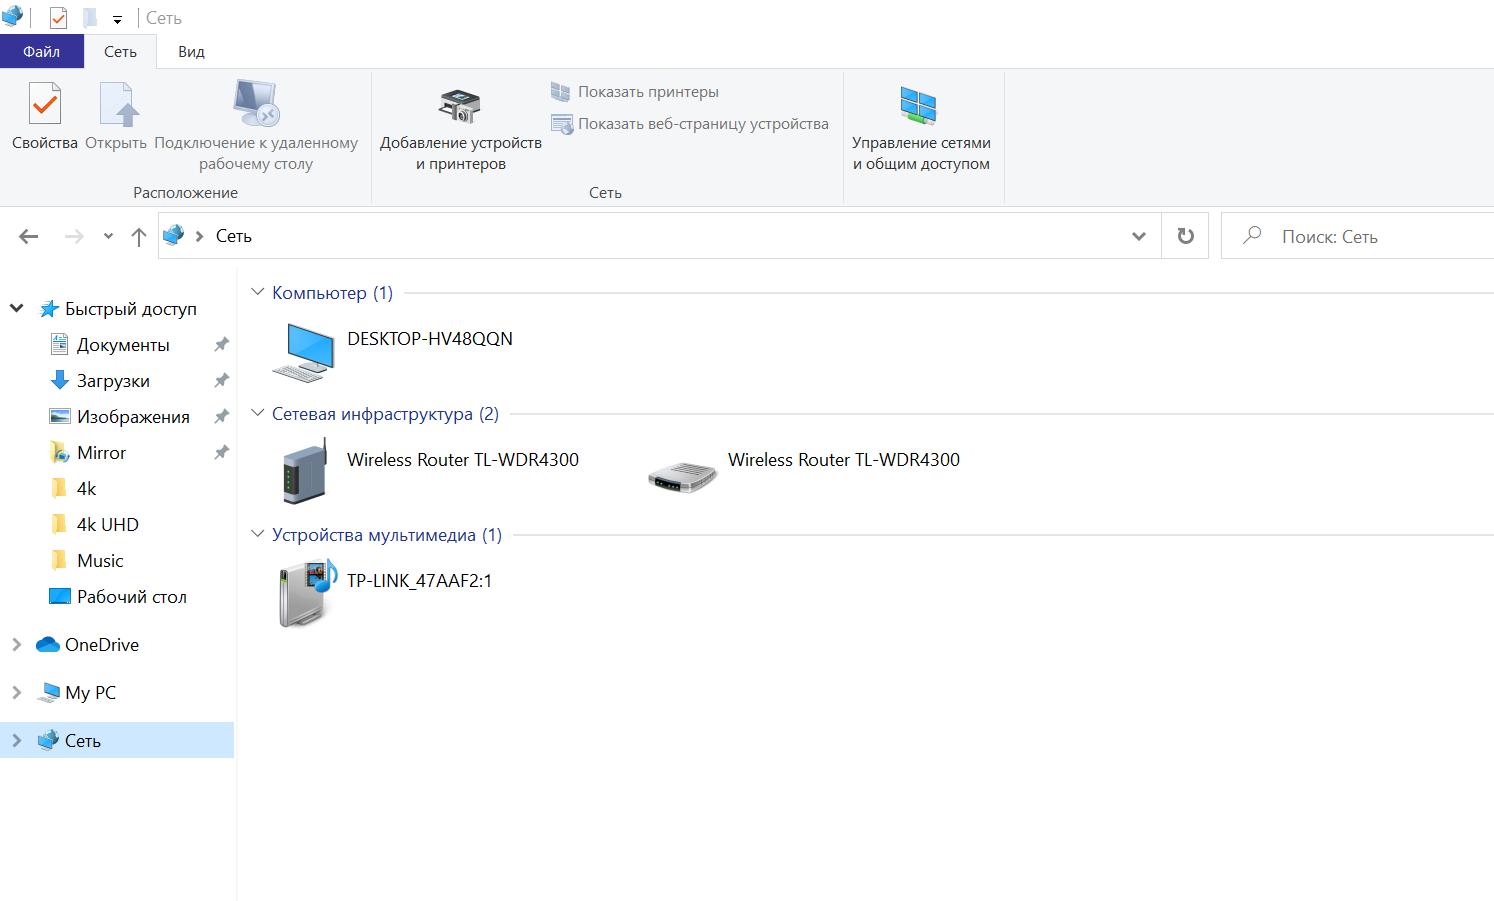 Сервер мультимедиа DLNA на LG